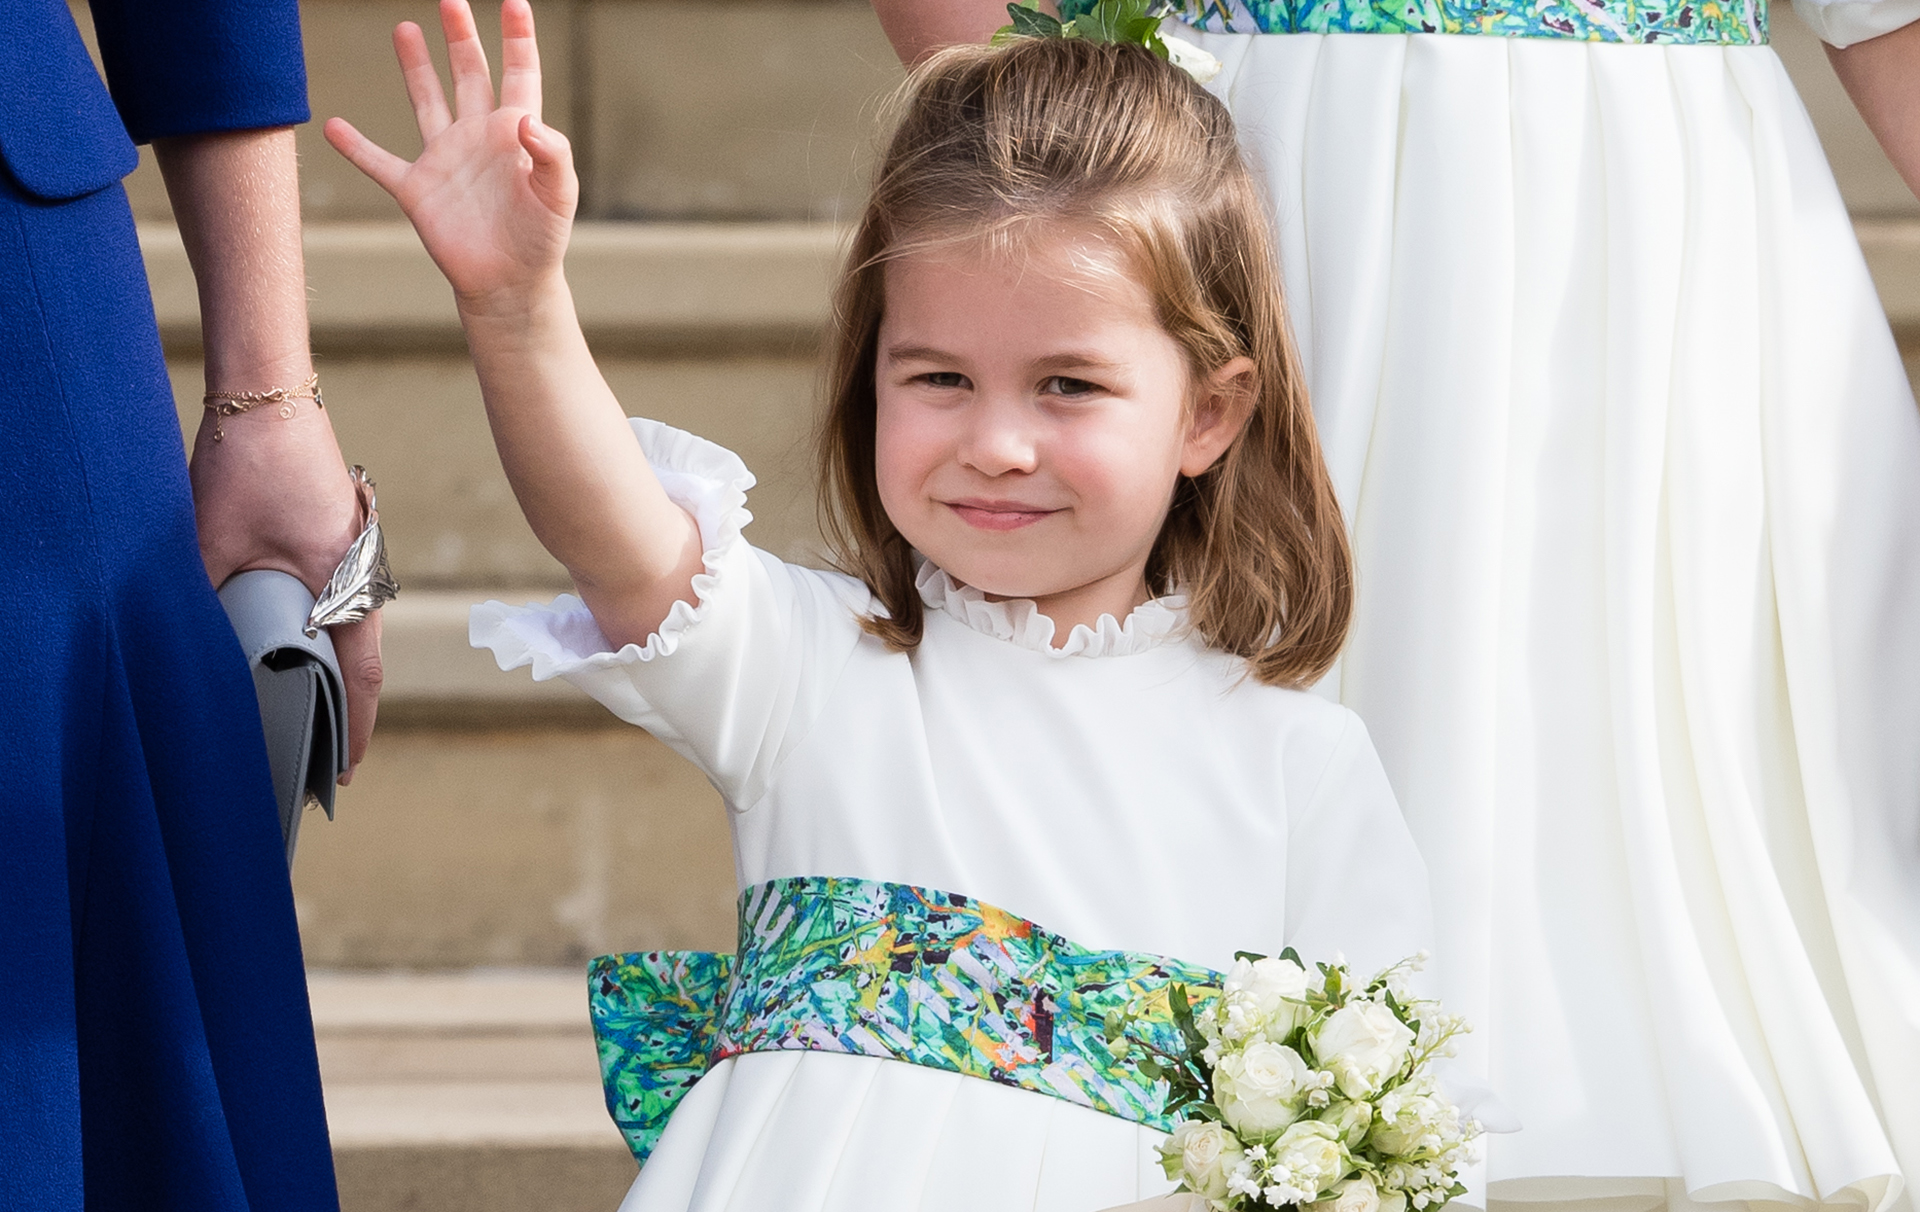 kate middleton queen award eighth wedding anniversary